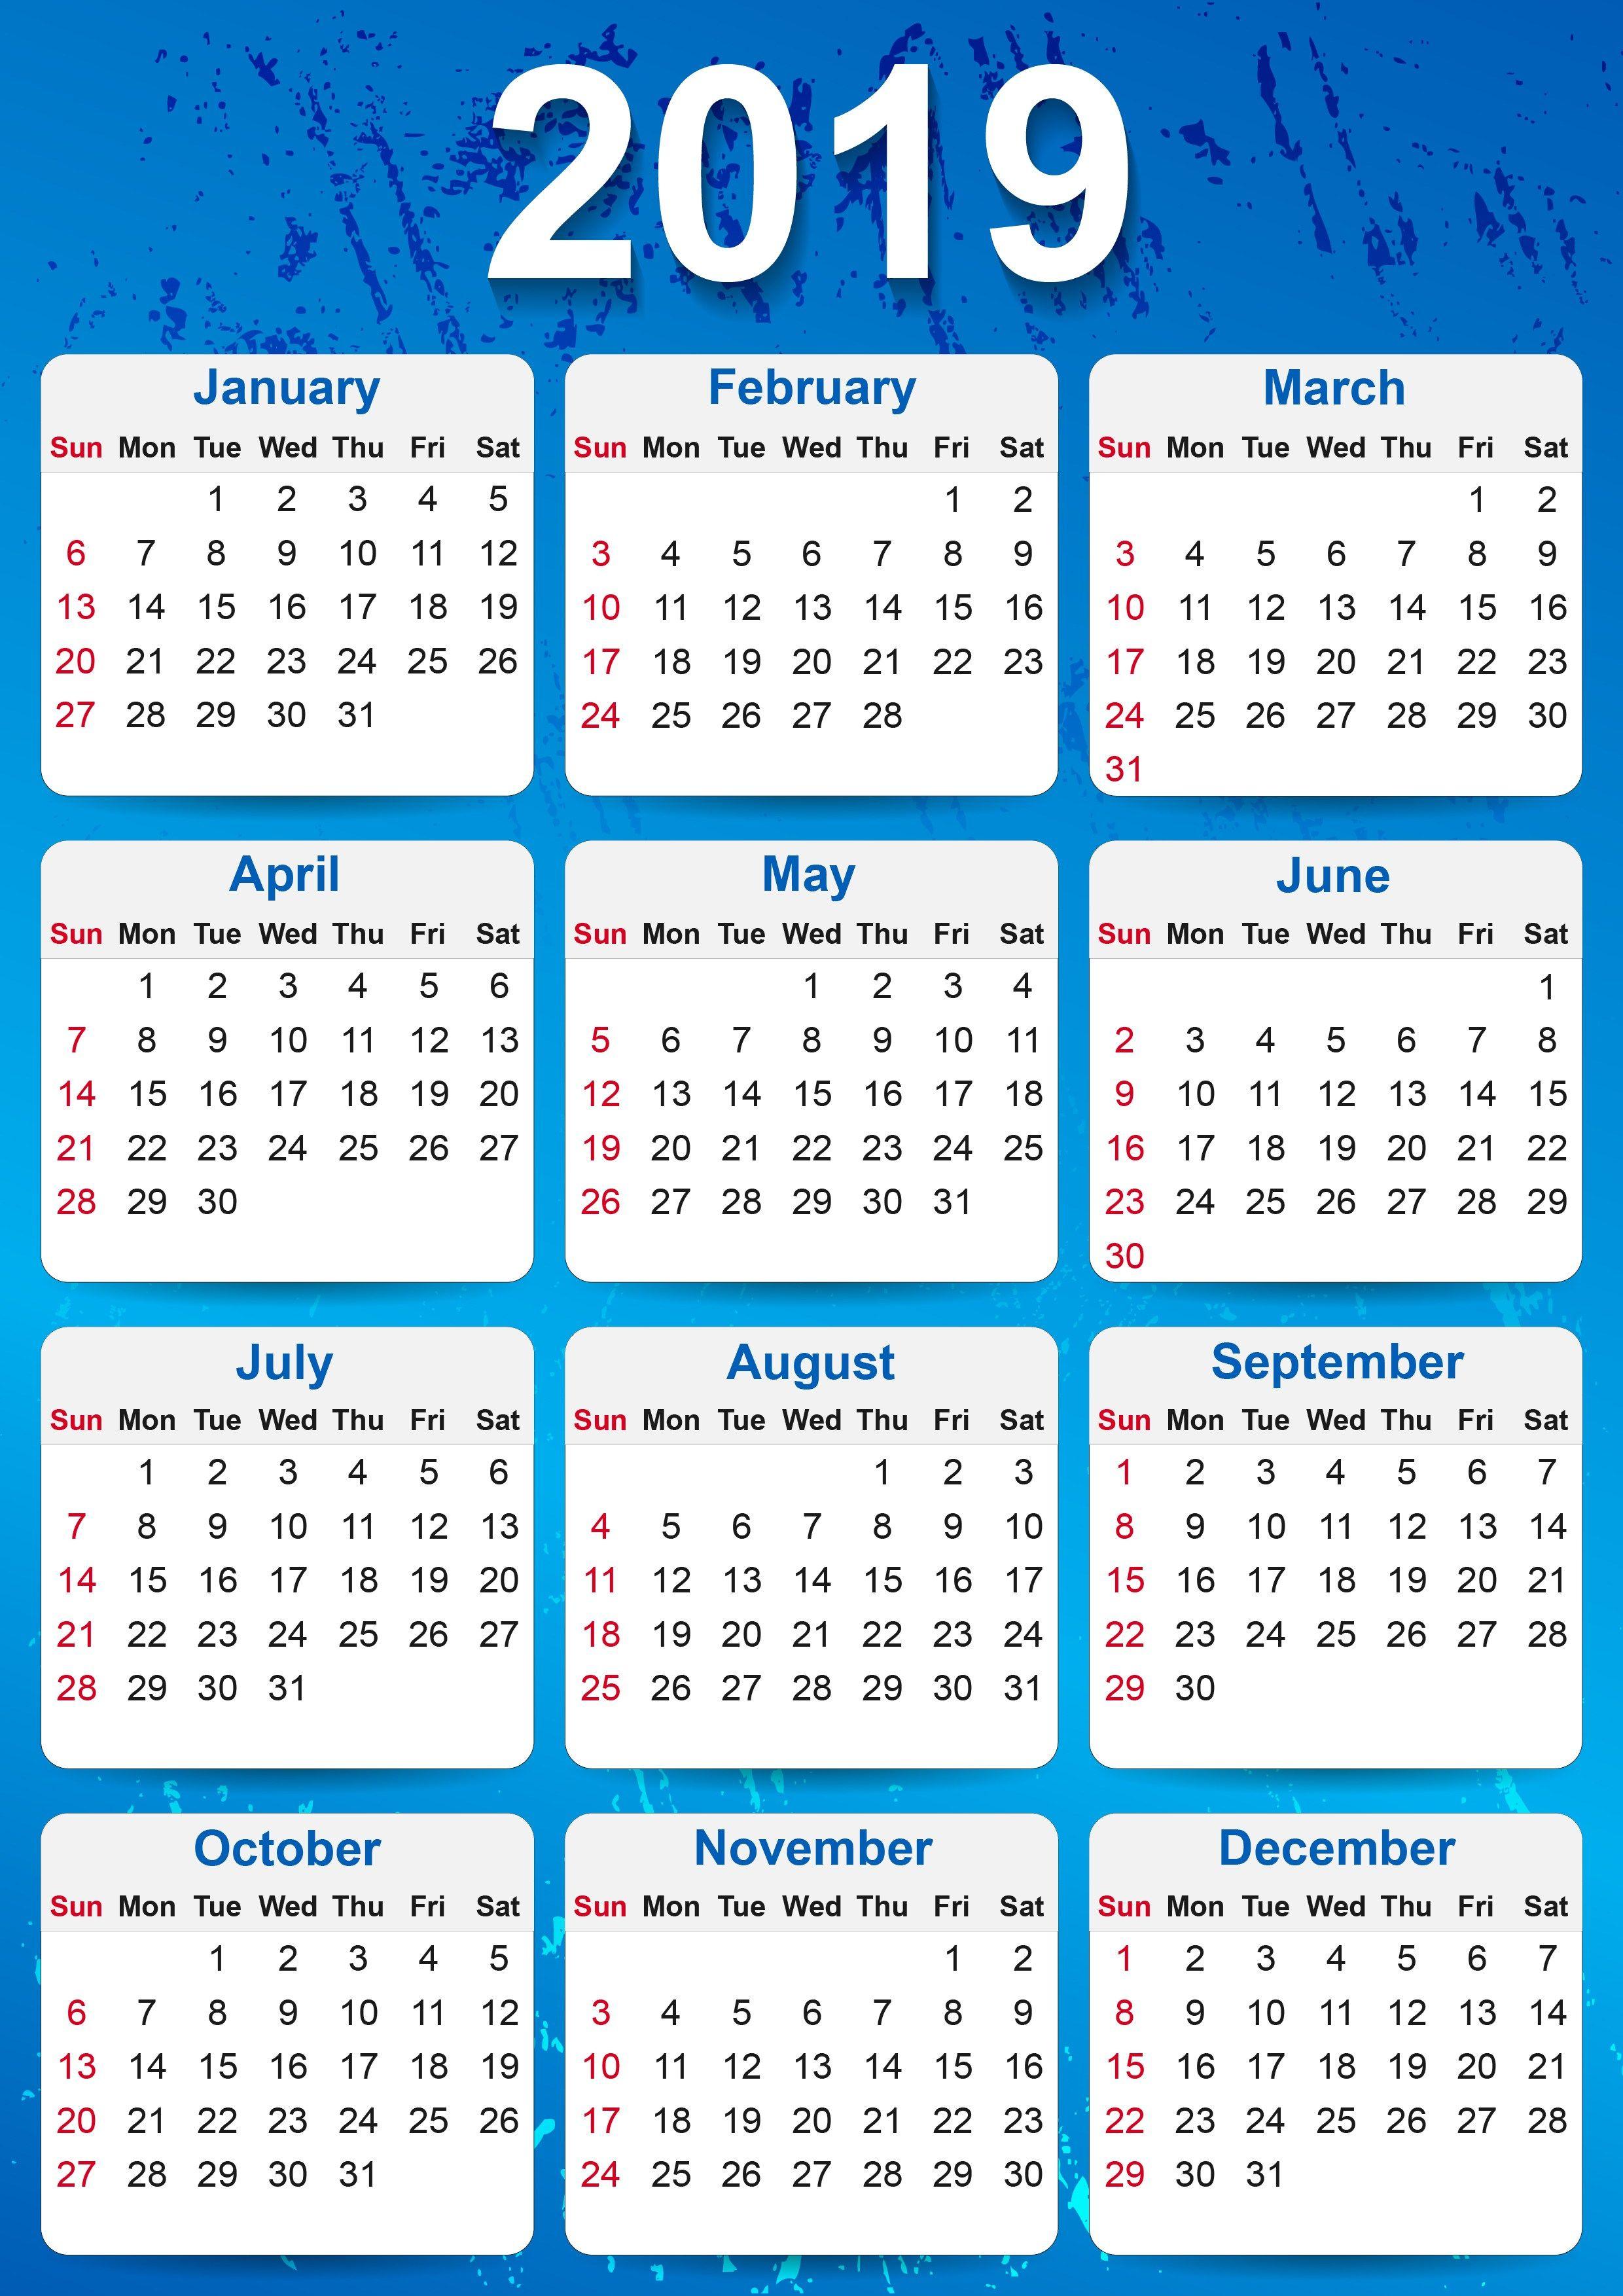 2019 Yearly Calendar Printable | 2019 Yearly Calendar